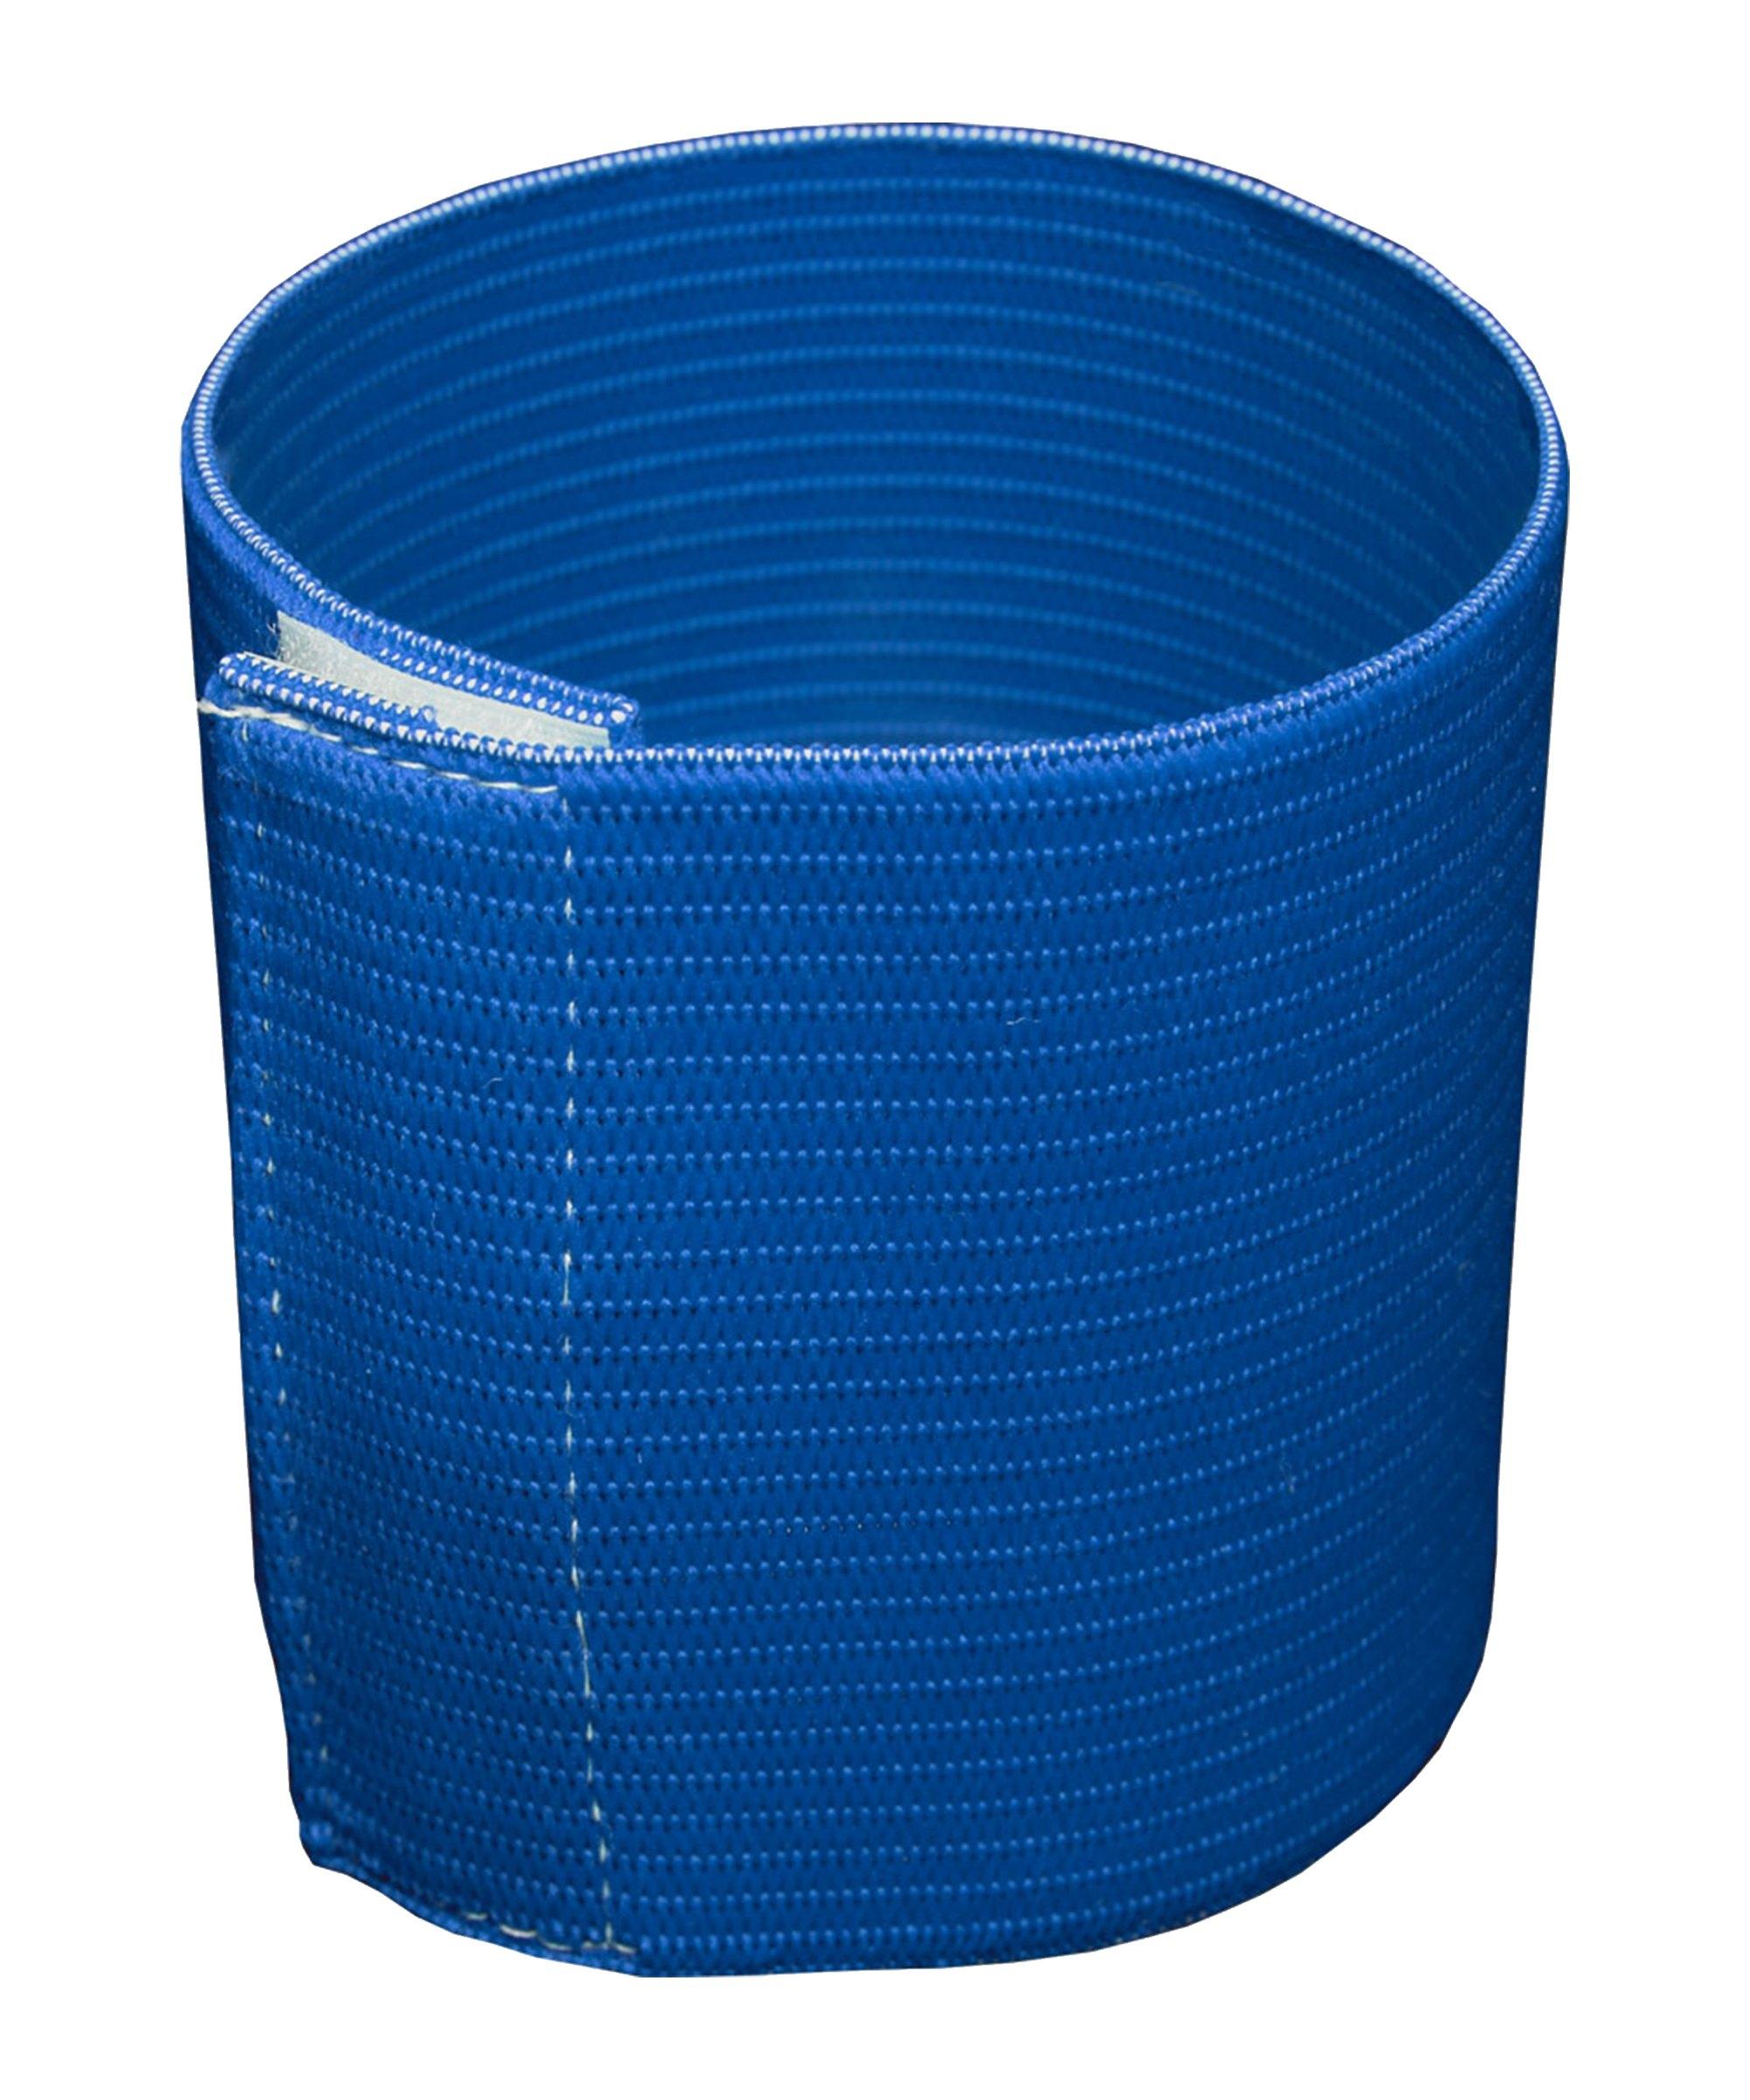 Cawila PRO UNI Armbinde Junior Blau - blau